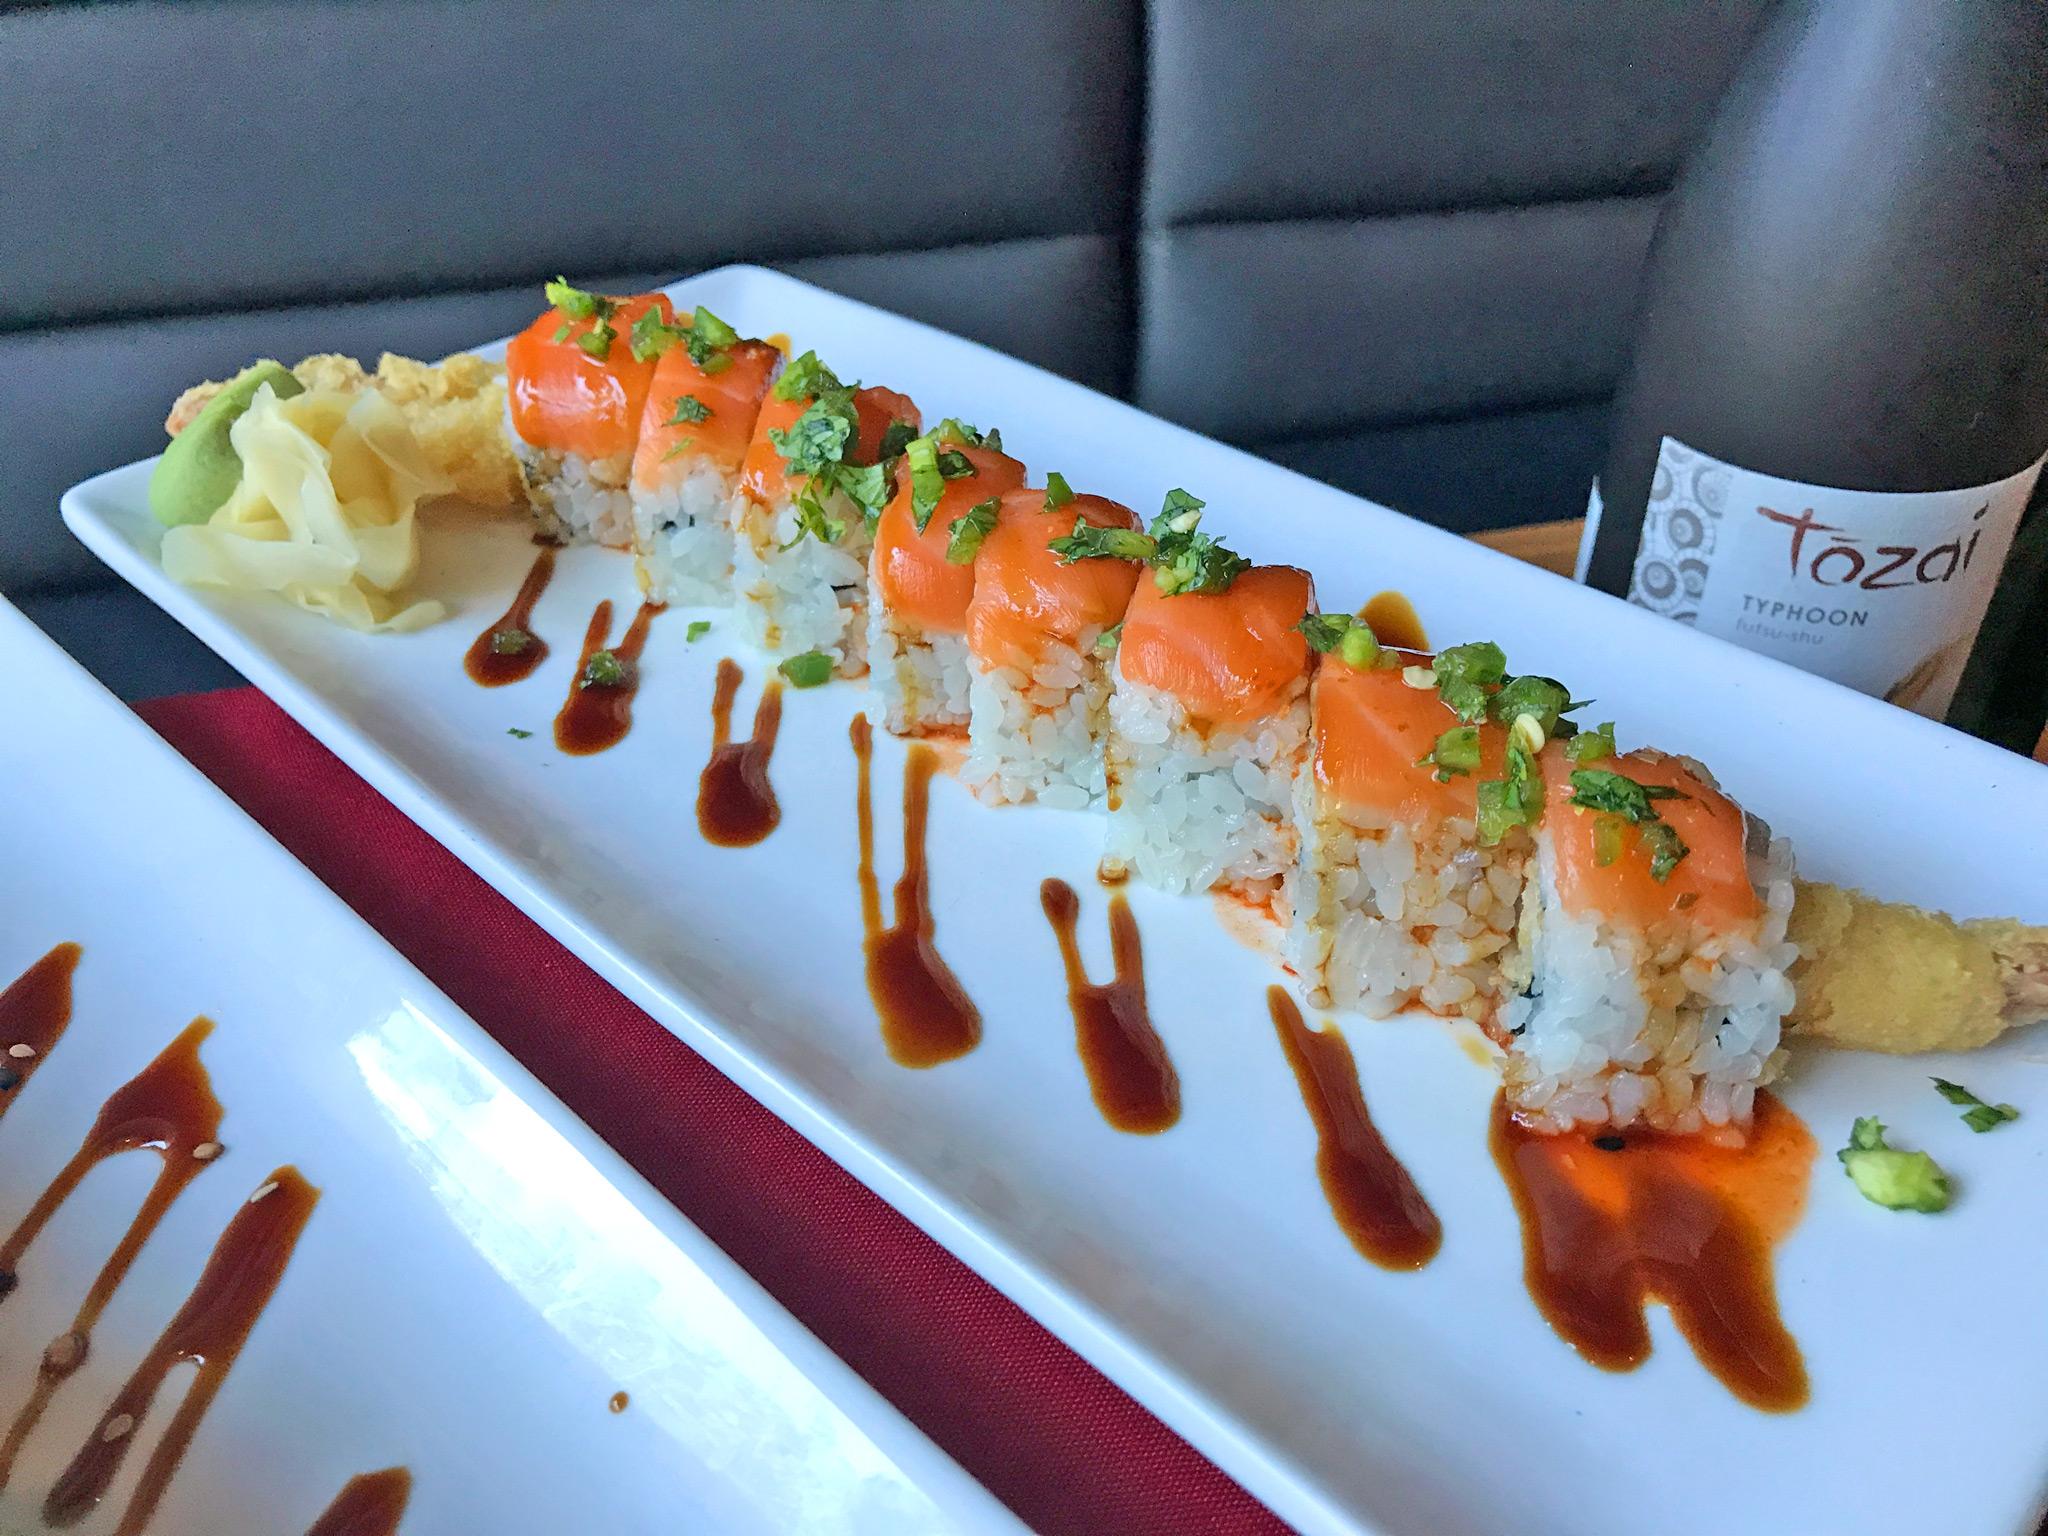 23 Dragons - tempura shrimp / salmon / avocado / eel sauce / jalapeño / cilantro